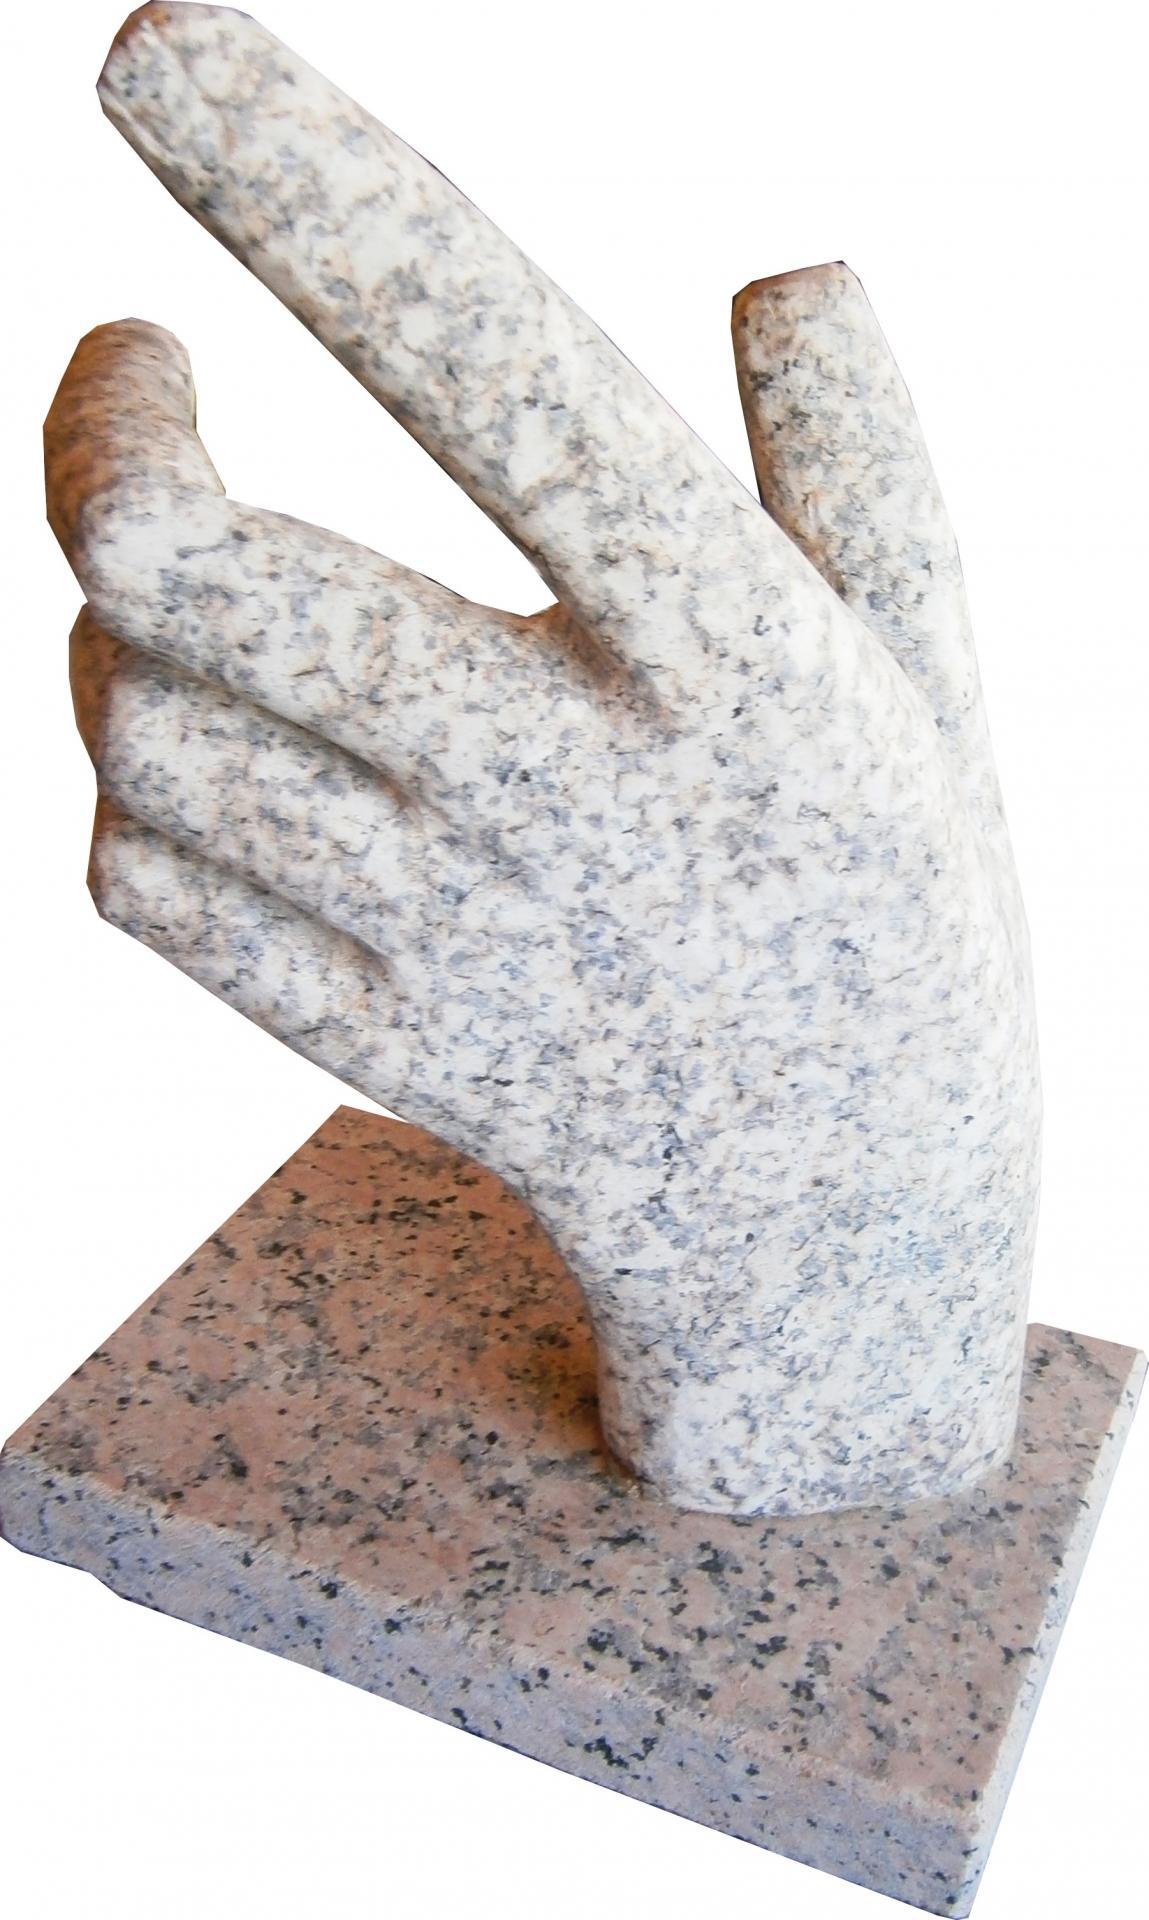 P6271532